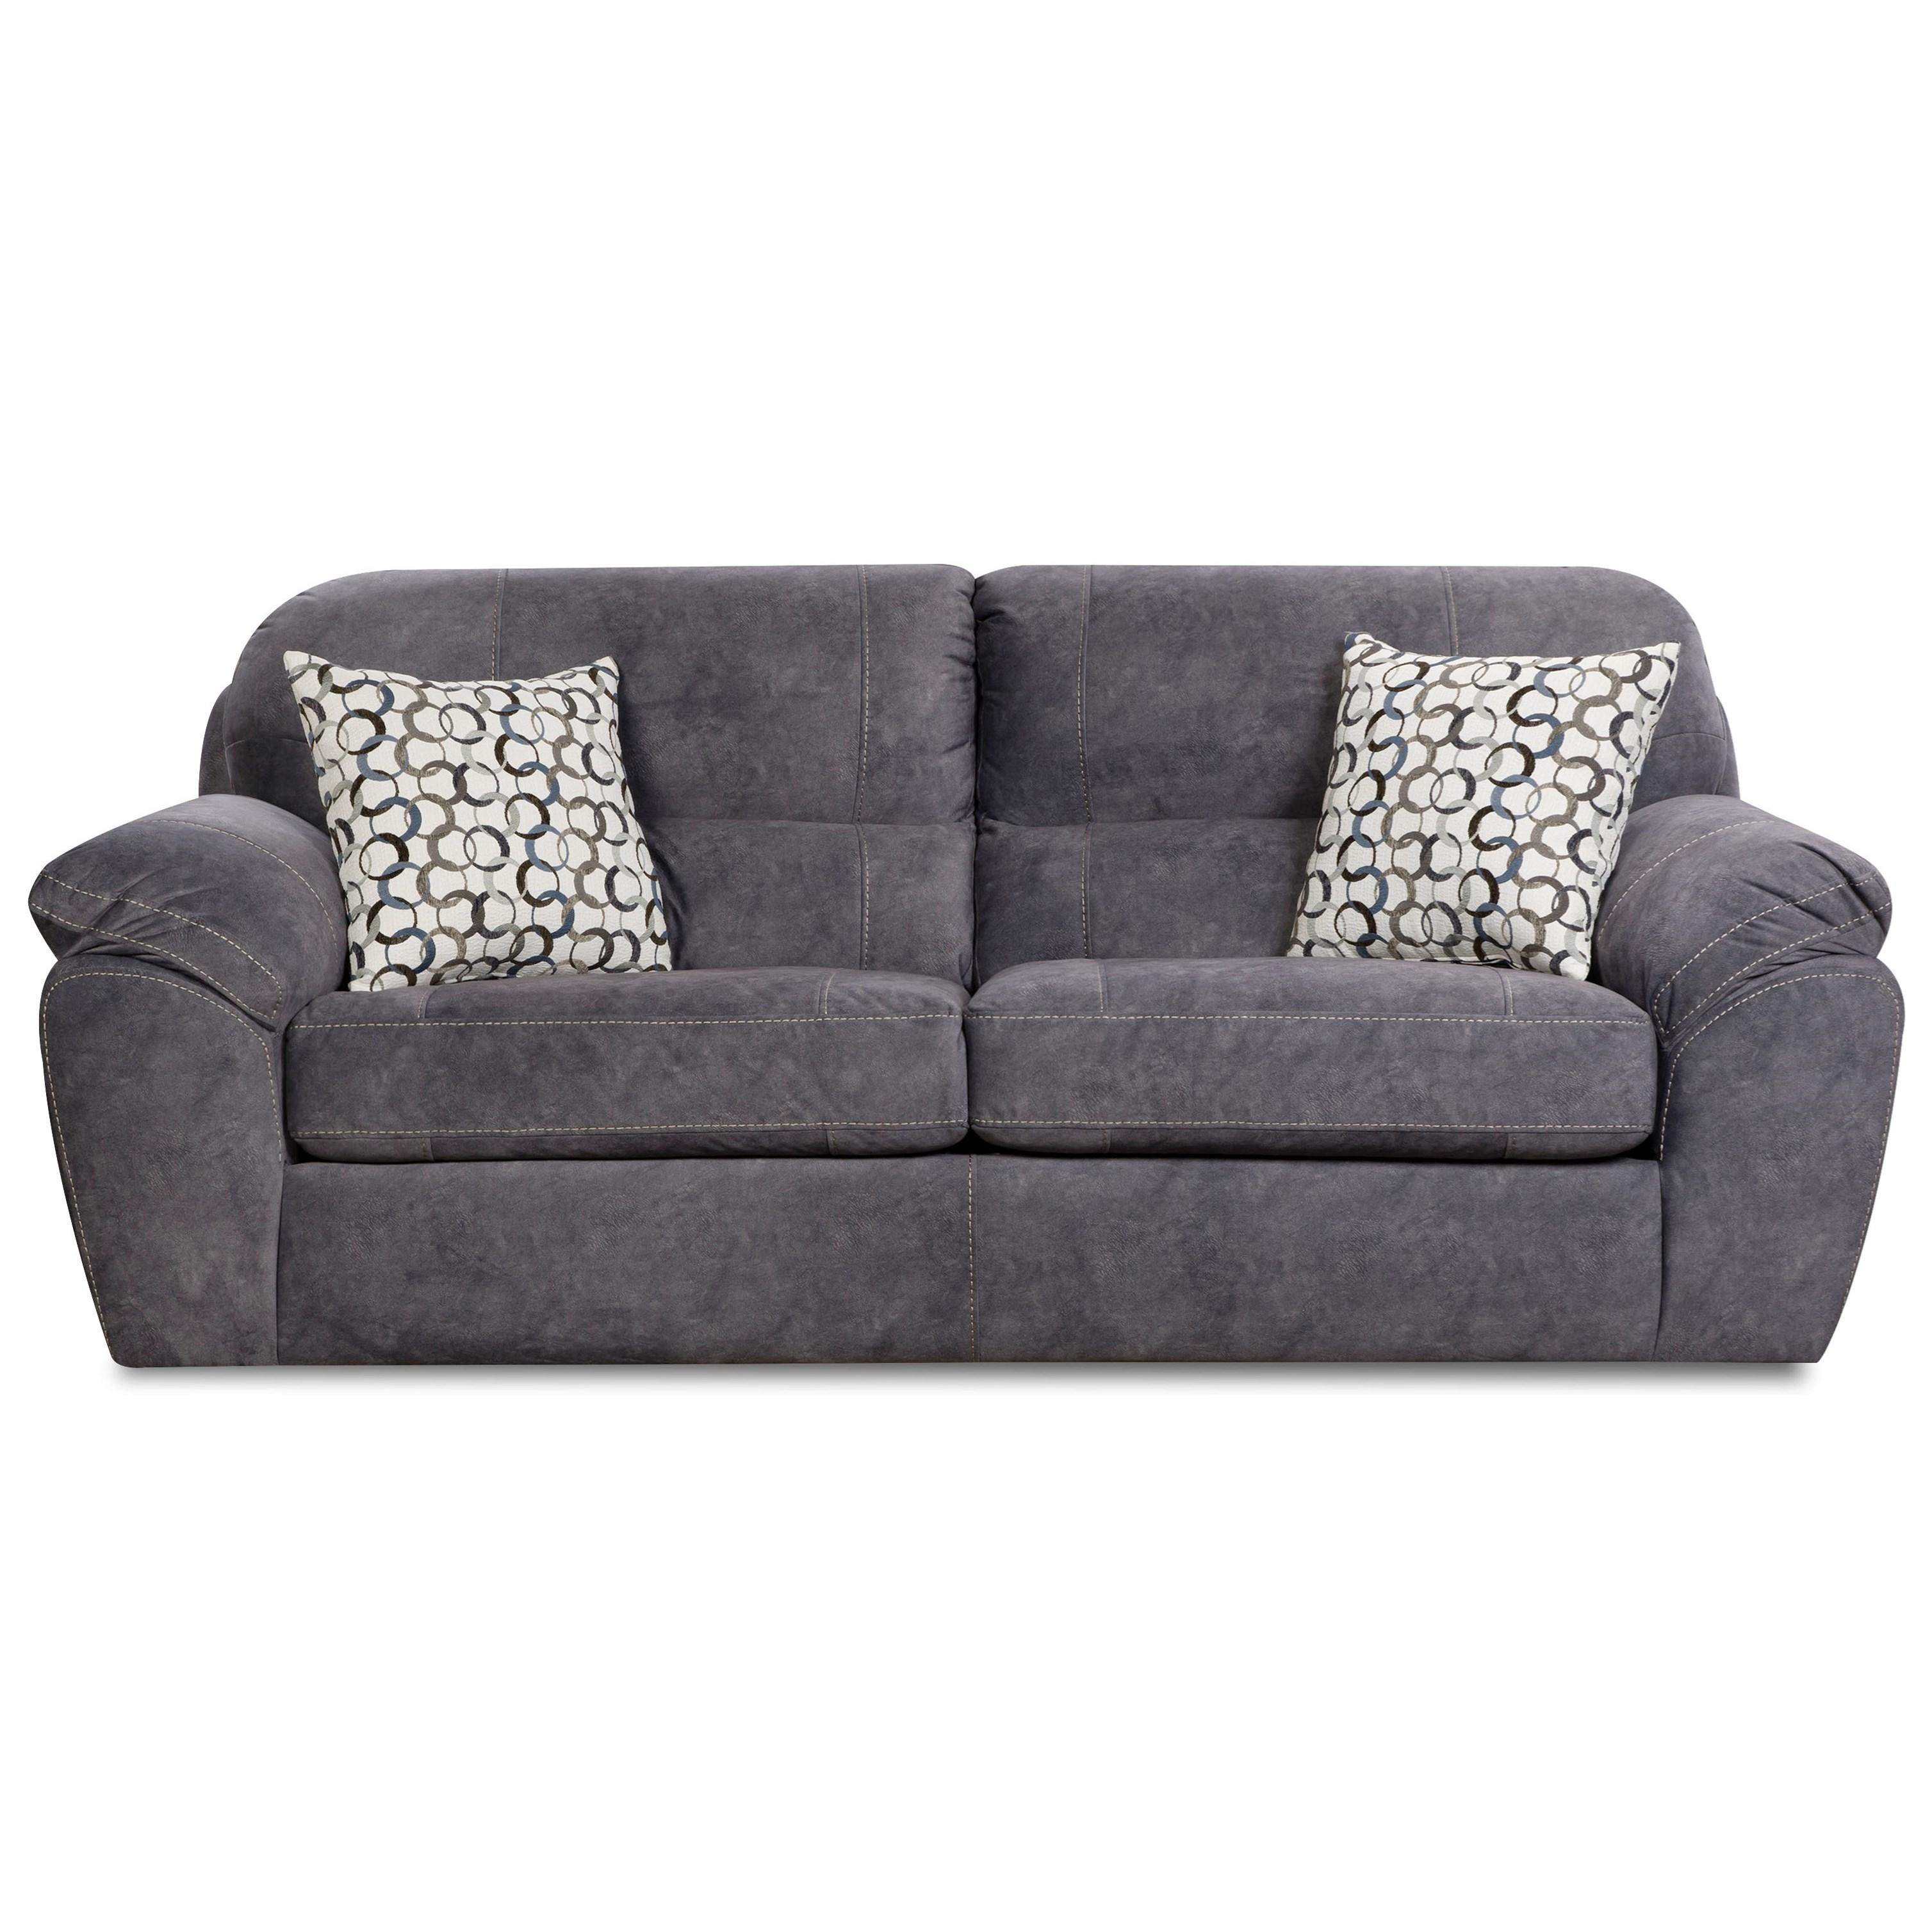 18C0 Sofa Sleeper by Corinthian at Story & Lee Furniture